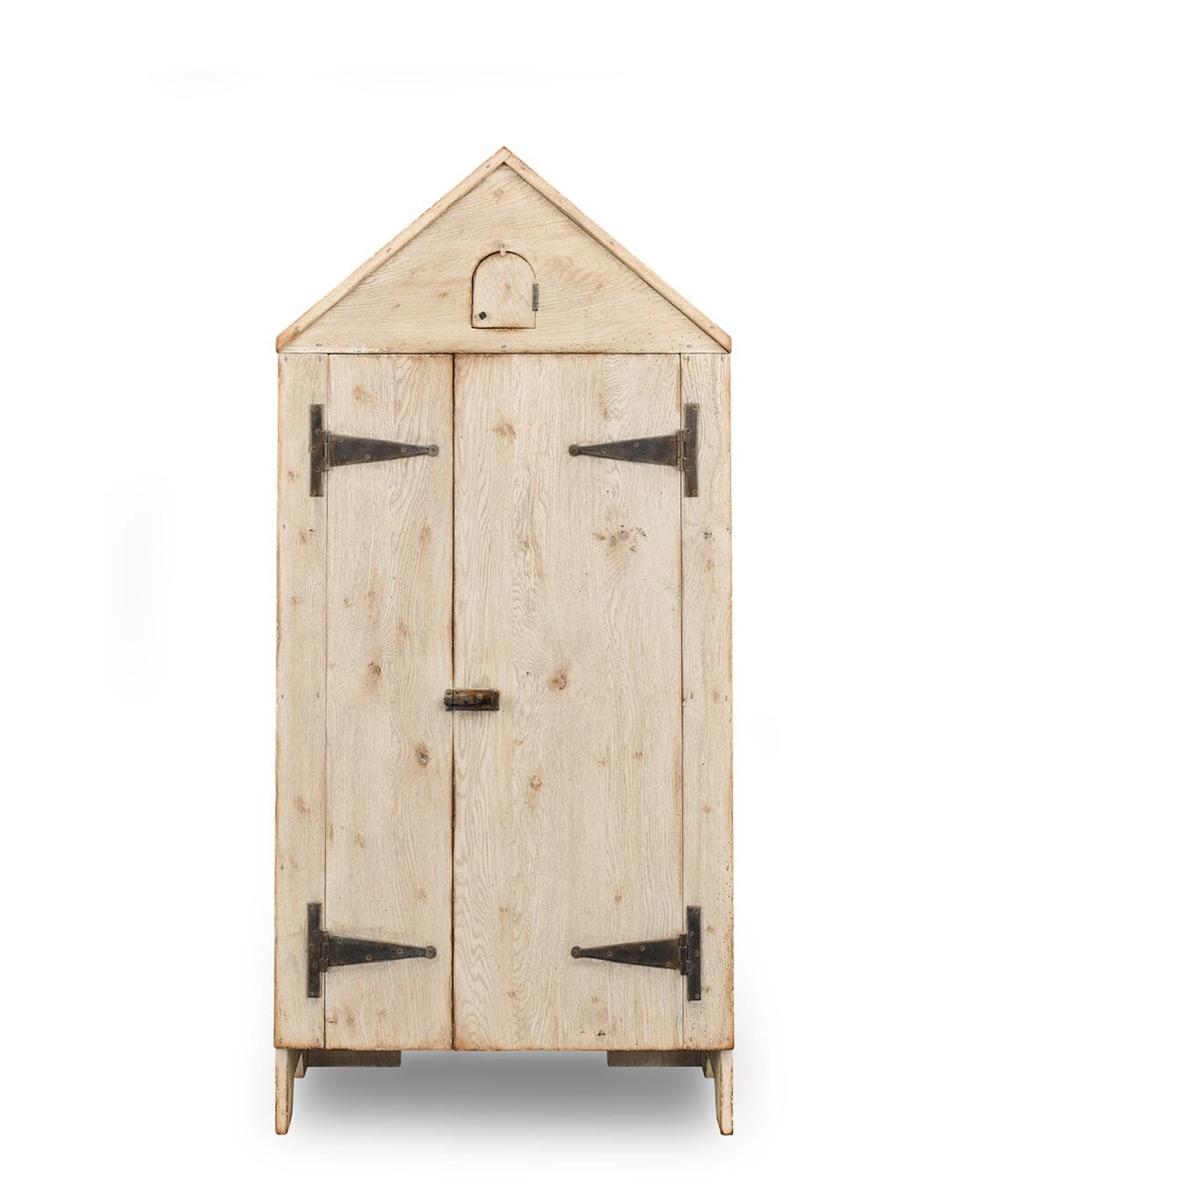 Wooden-Birdhouse-Cabinet_web.jpg